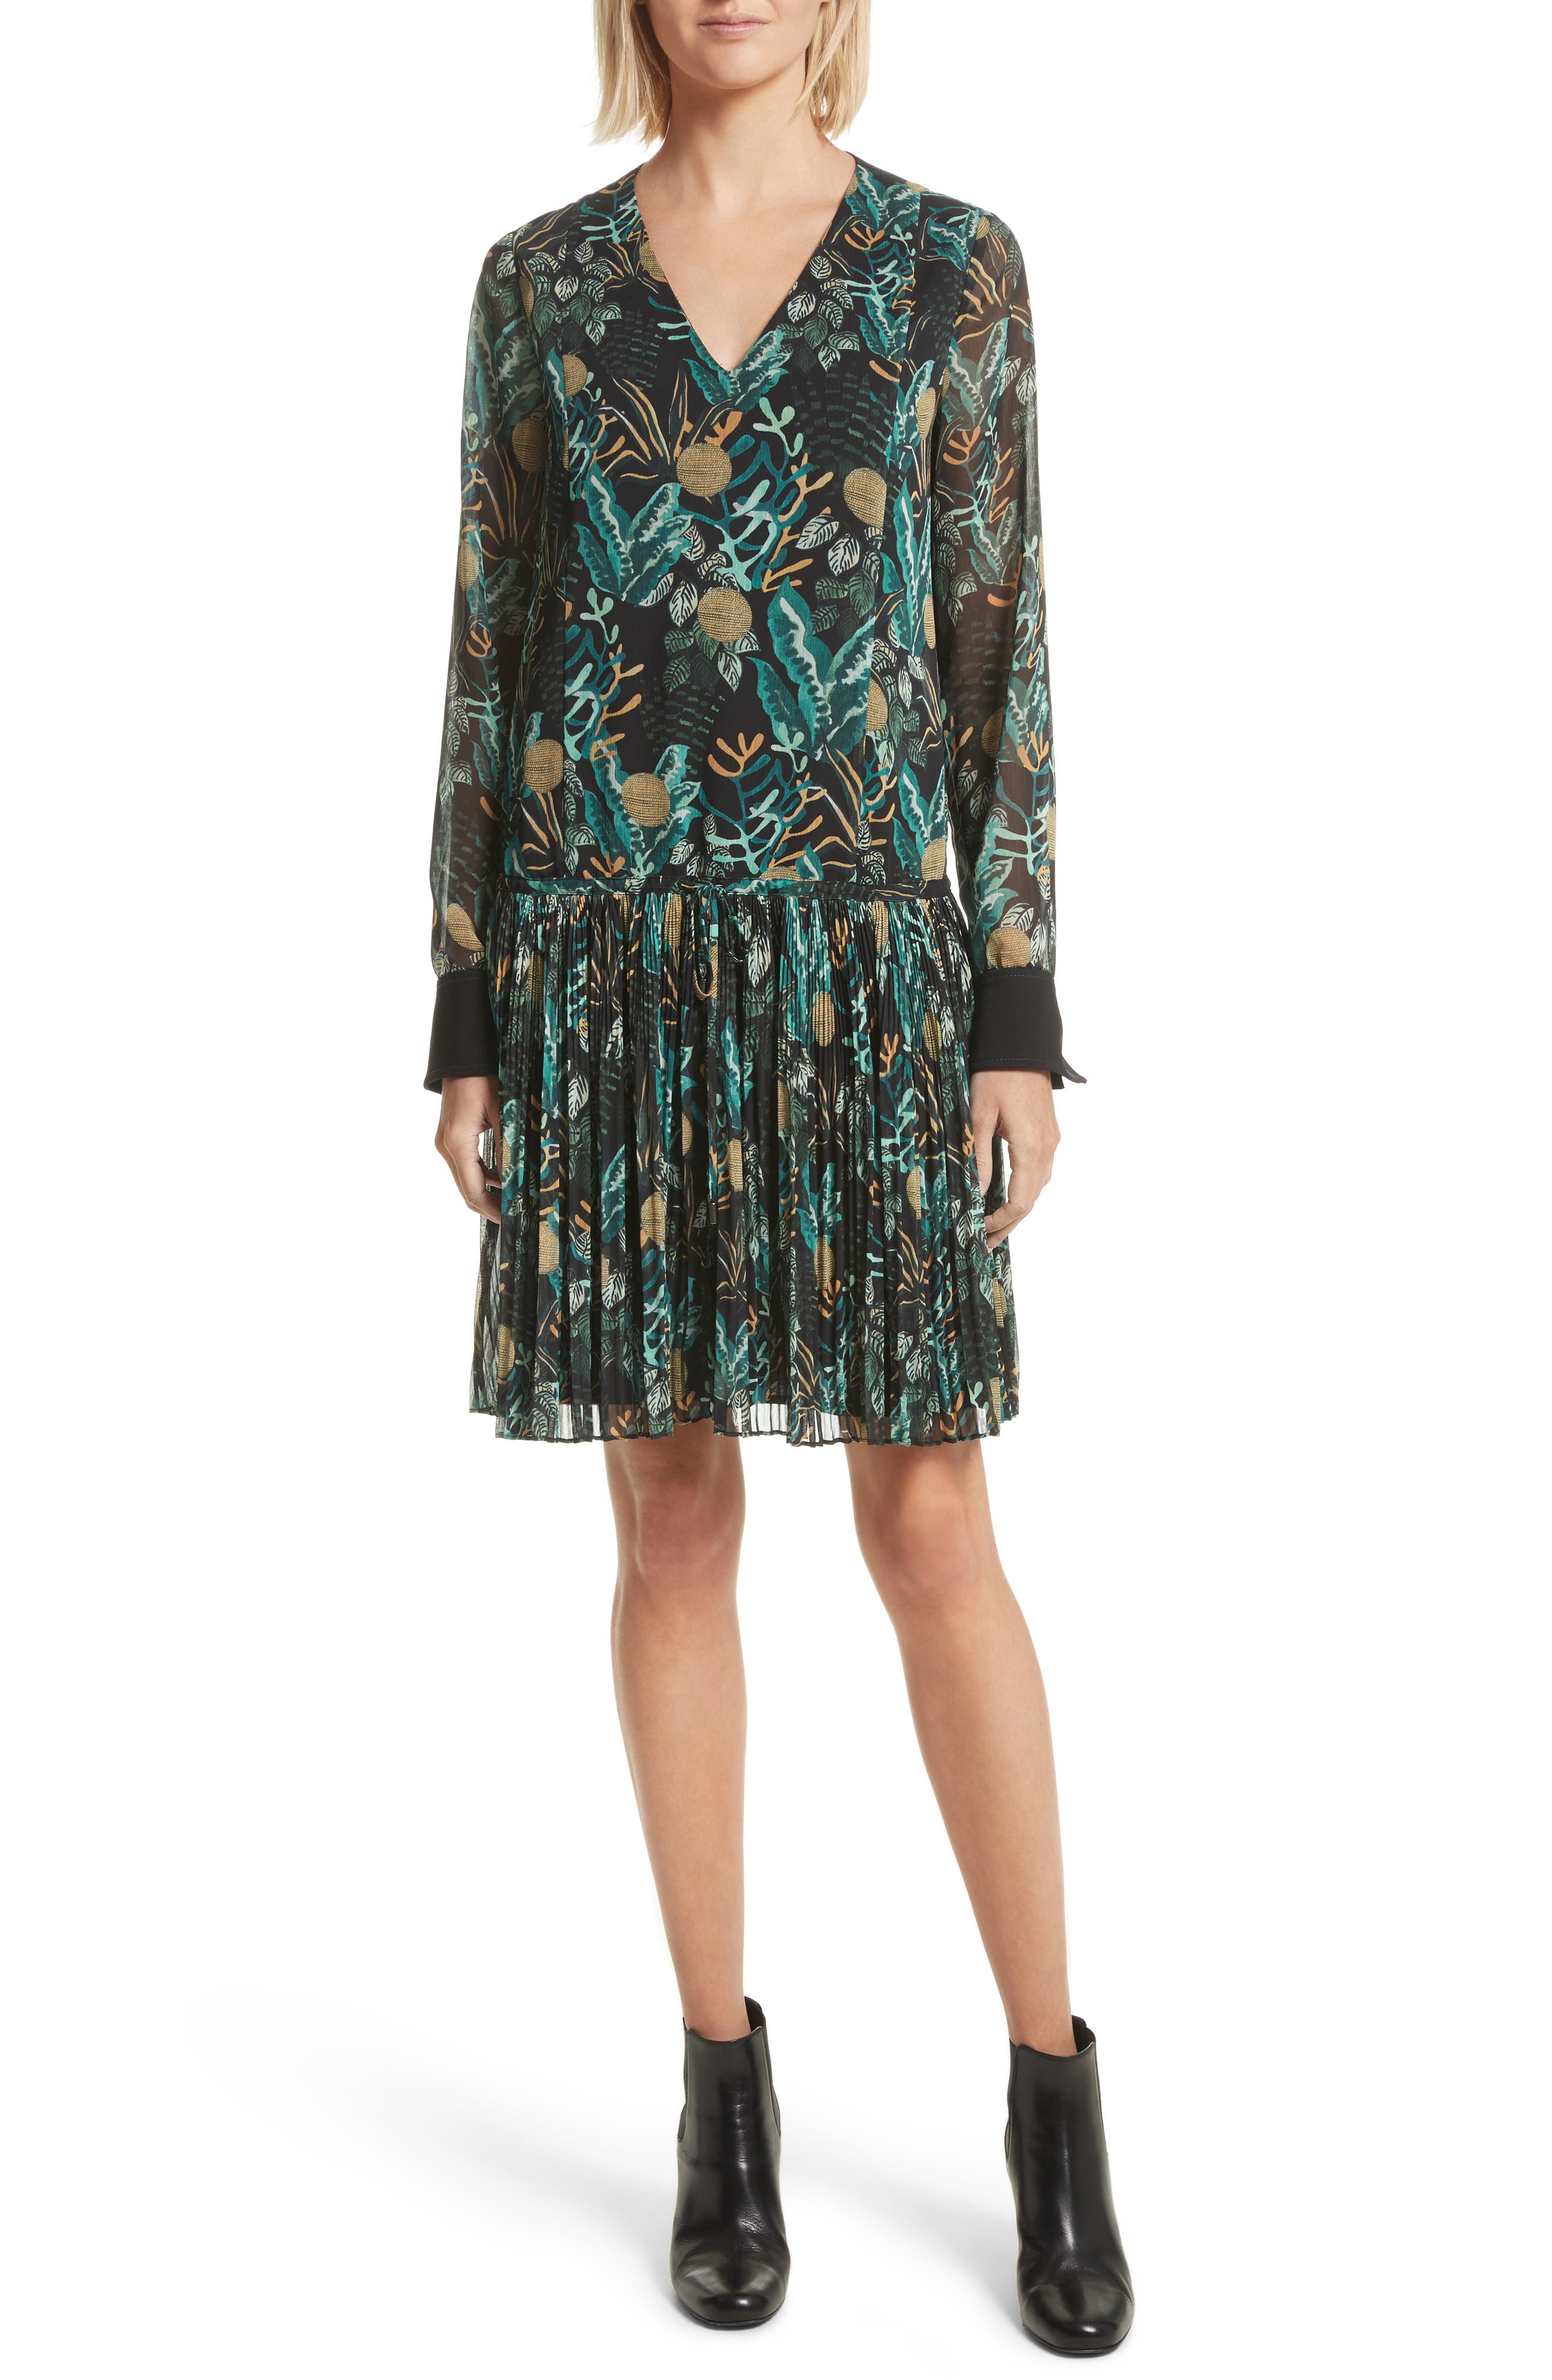 GREY Jason Wu Print Drop Waist Drawstring Dress